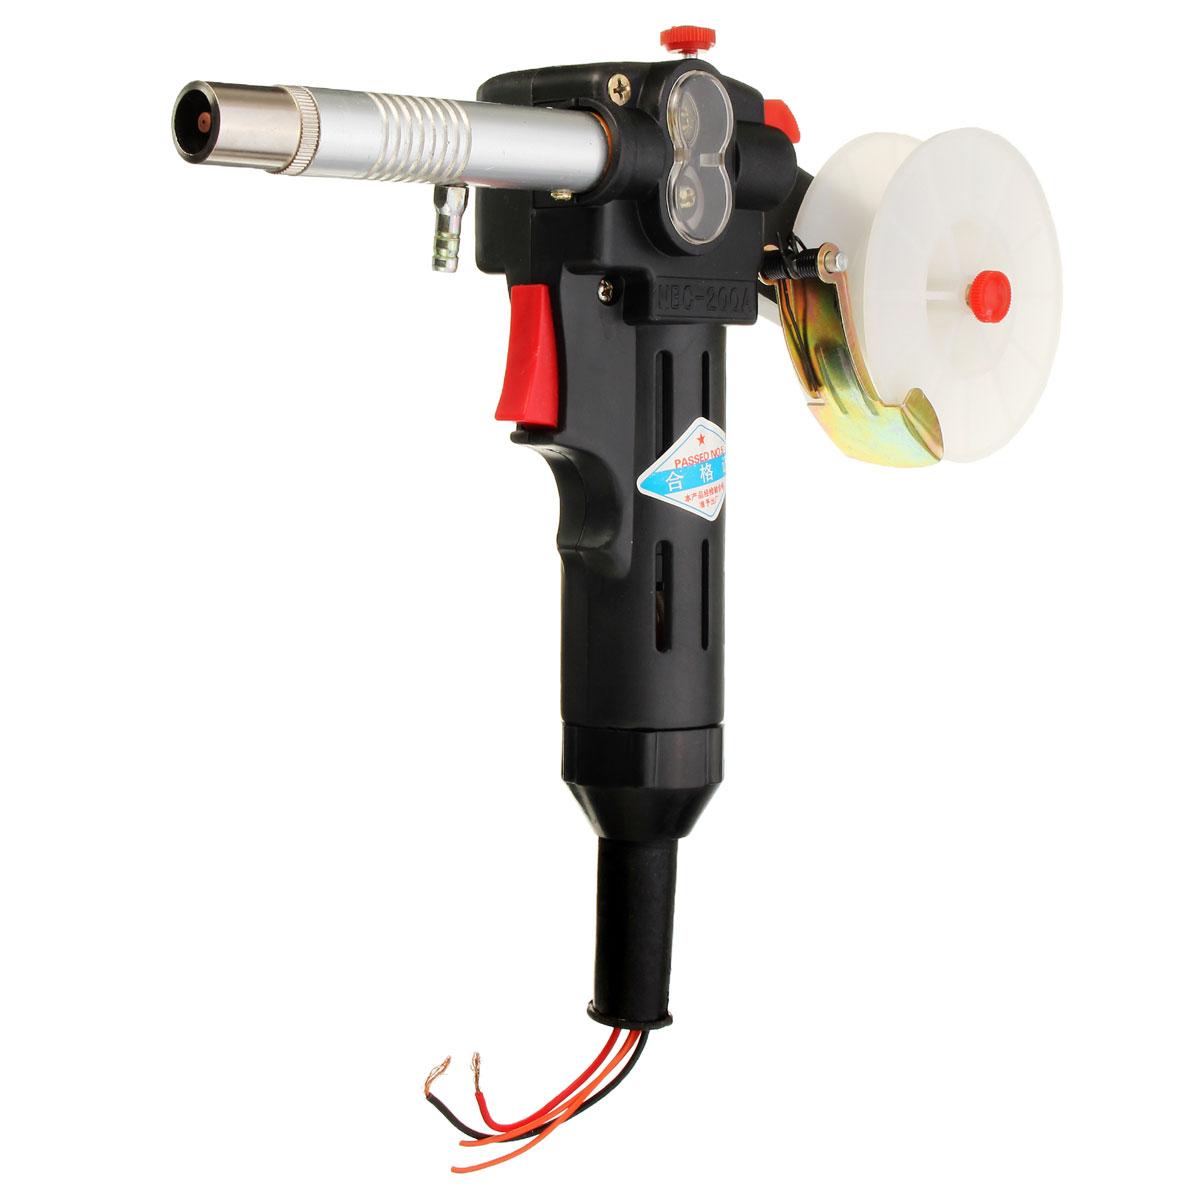 Miller Welding >> 180A Miller MIG Spool Gun Push Pull Feeder Aluminum Welding Torch without Cable | Alexnld.com